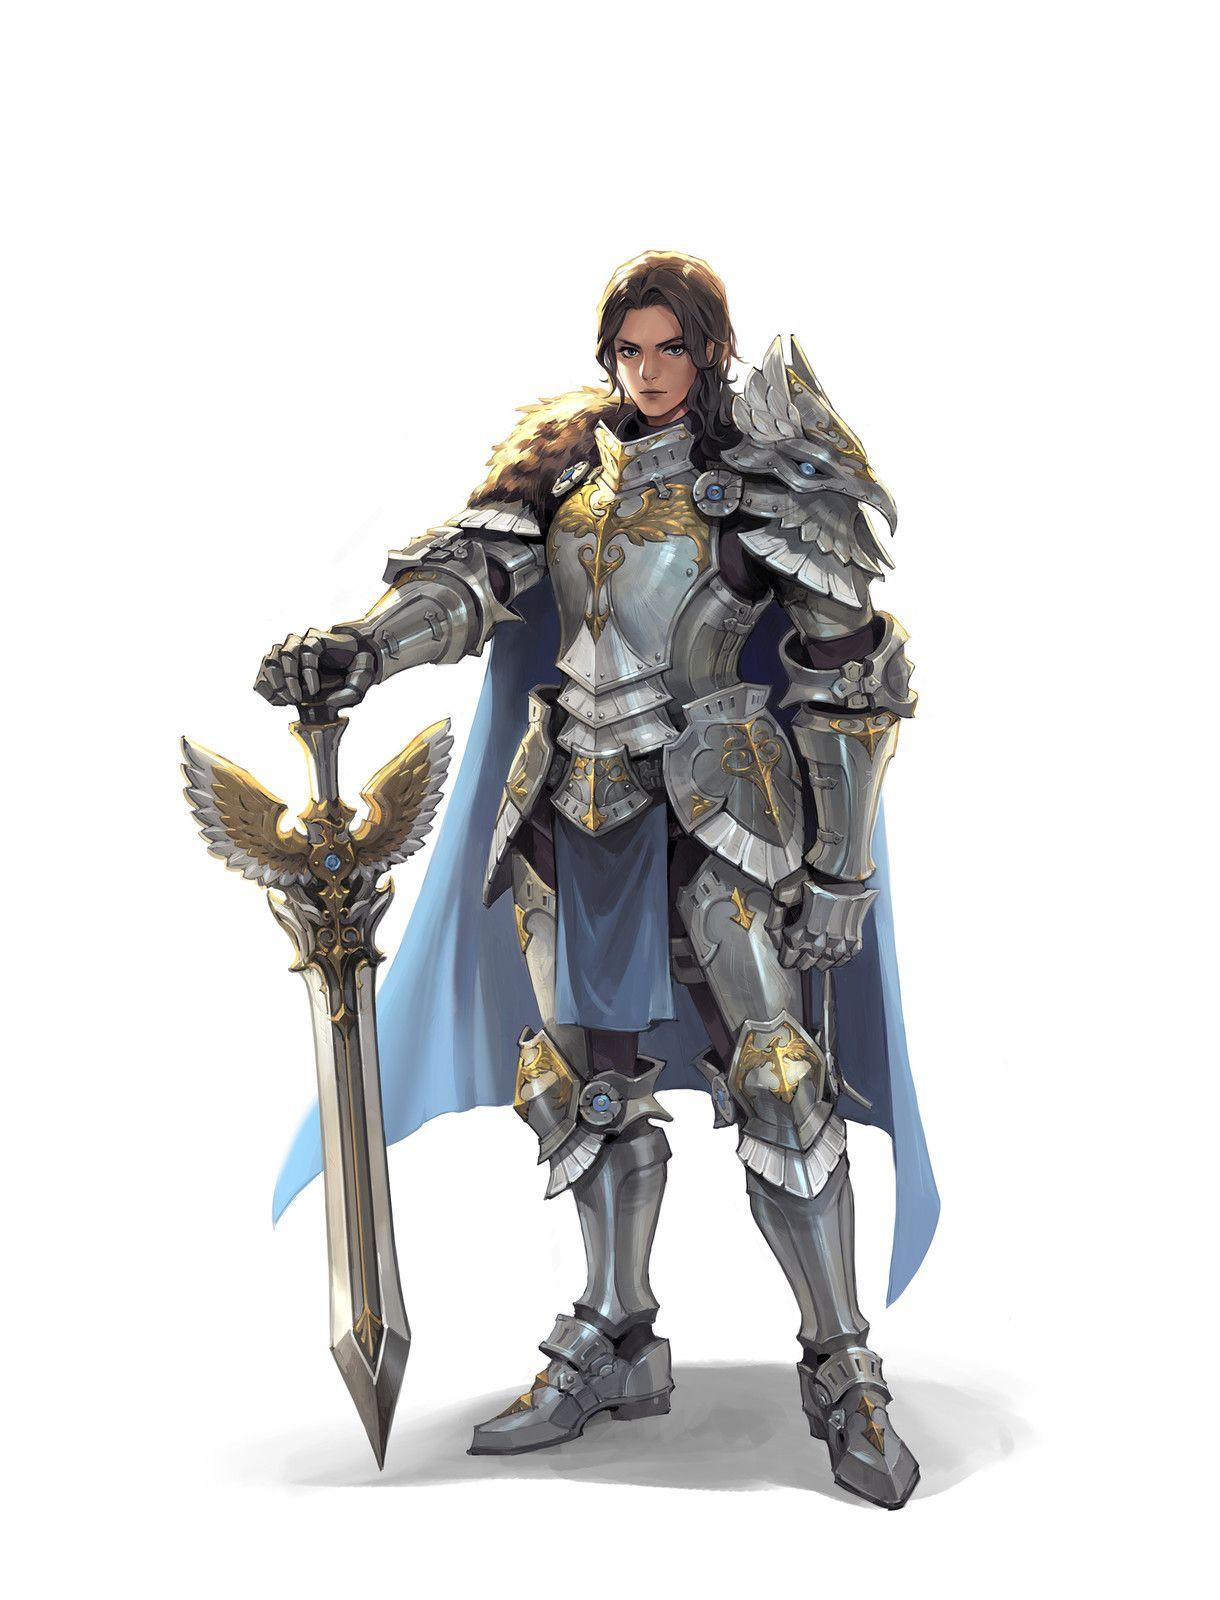 160217 Hawk Armor Sora Kim Female Knight Fantasy Armor Armor Concept